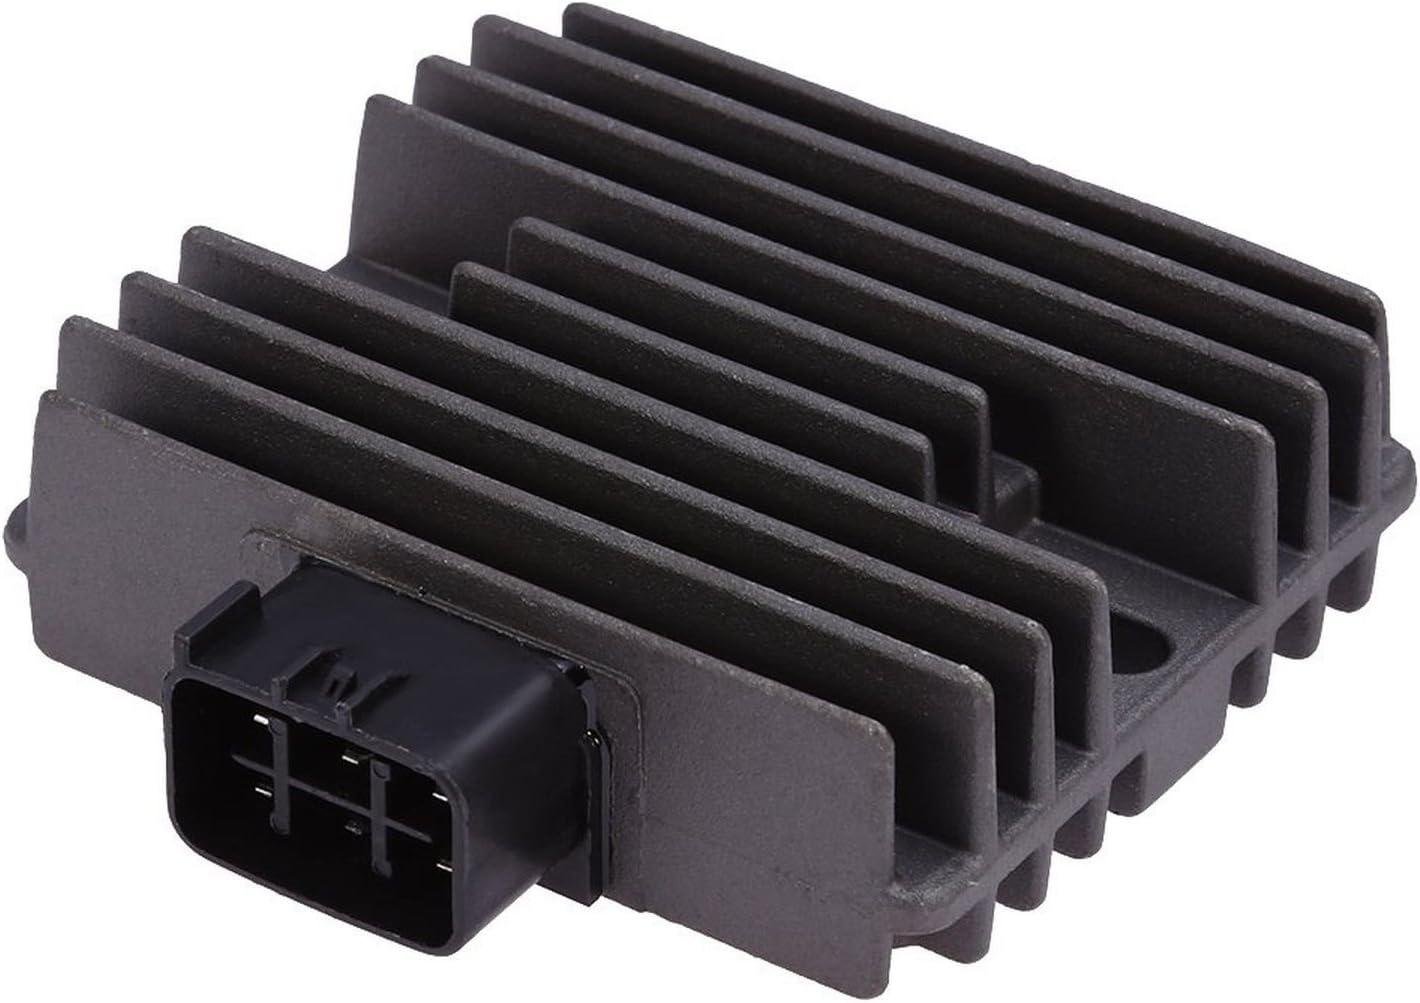 Voltage Regulator Rectifier For CAN-AM Outlander 330 400,Honda TRX 400//450//500,Suzuki LT-A 400 450 500 700 750,Yamaha R6 YFM660 YFM700 YXR660 XP500 XVS1100